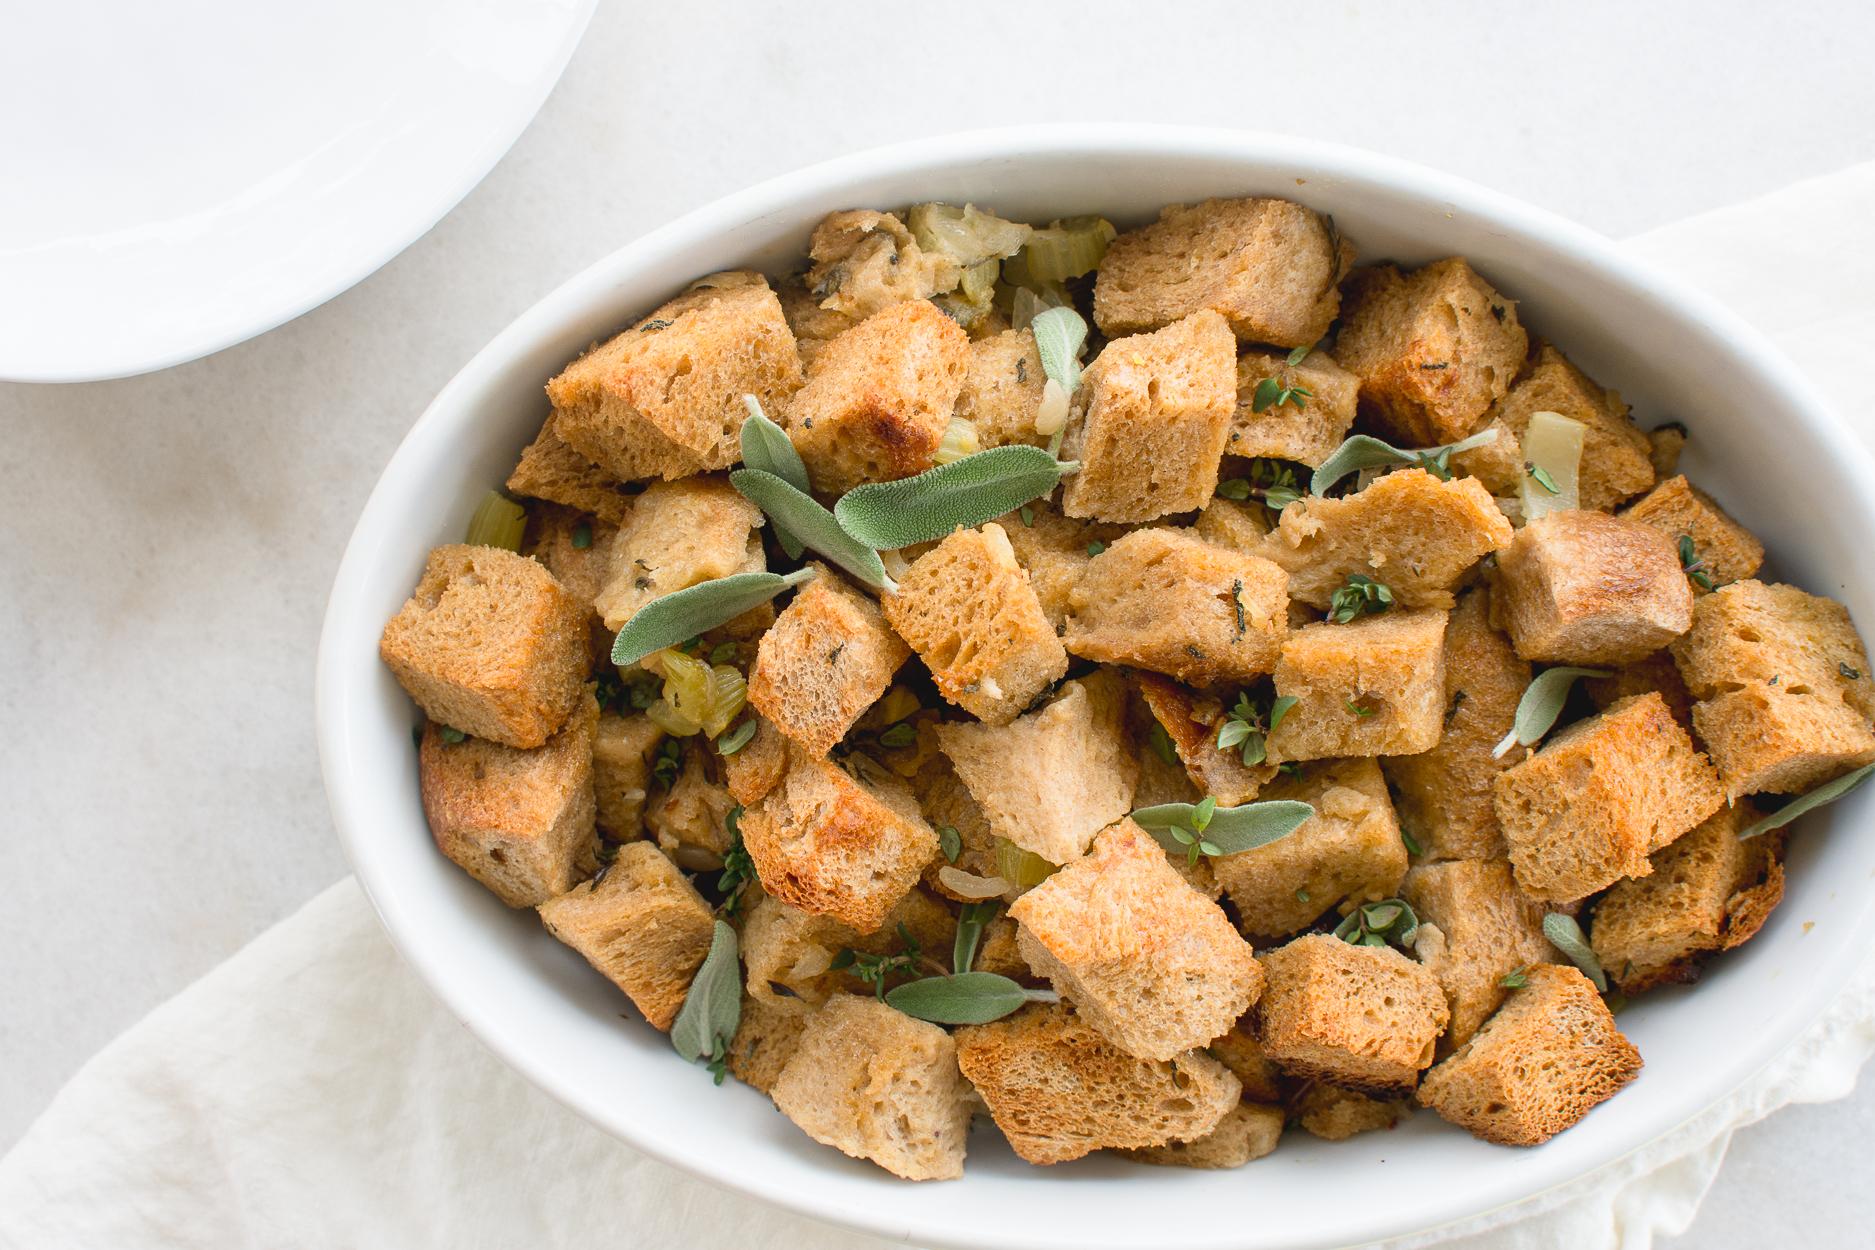 Sourdough stuffing recipe made with fresh garden herbs.